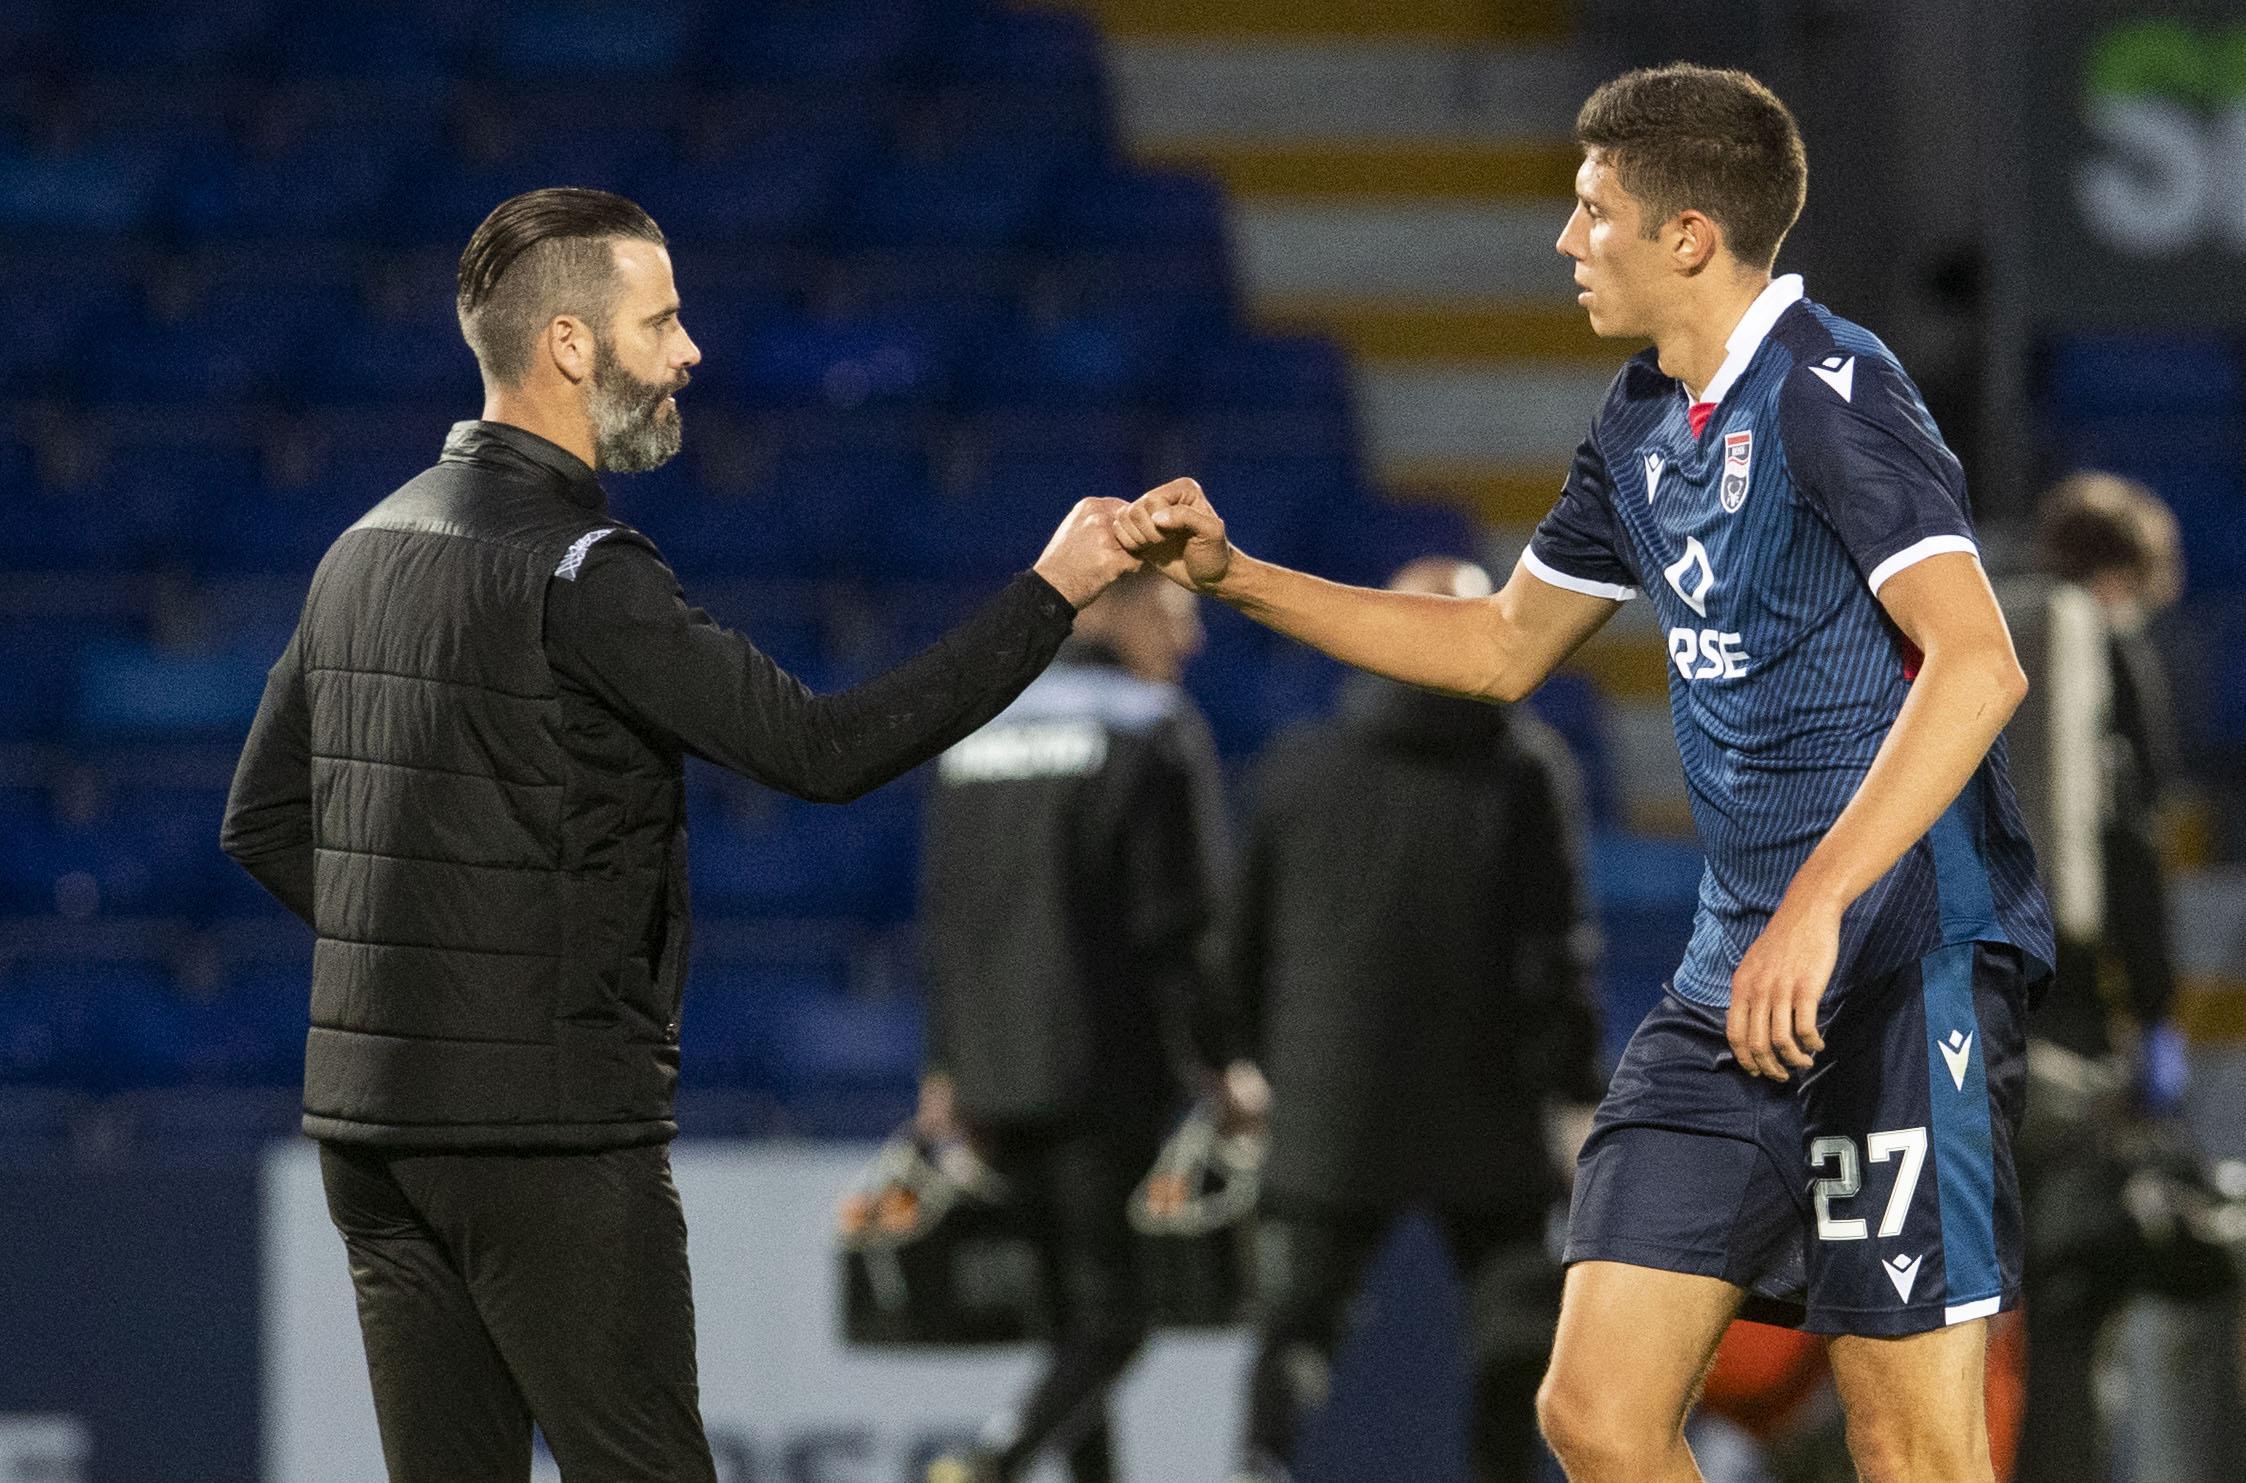 Ross County manager Stuart Kettlewell (left) congratulates goalscorer Ross Stewart at full-time.